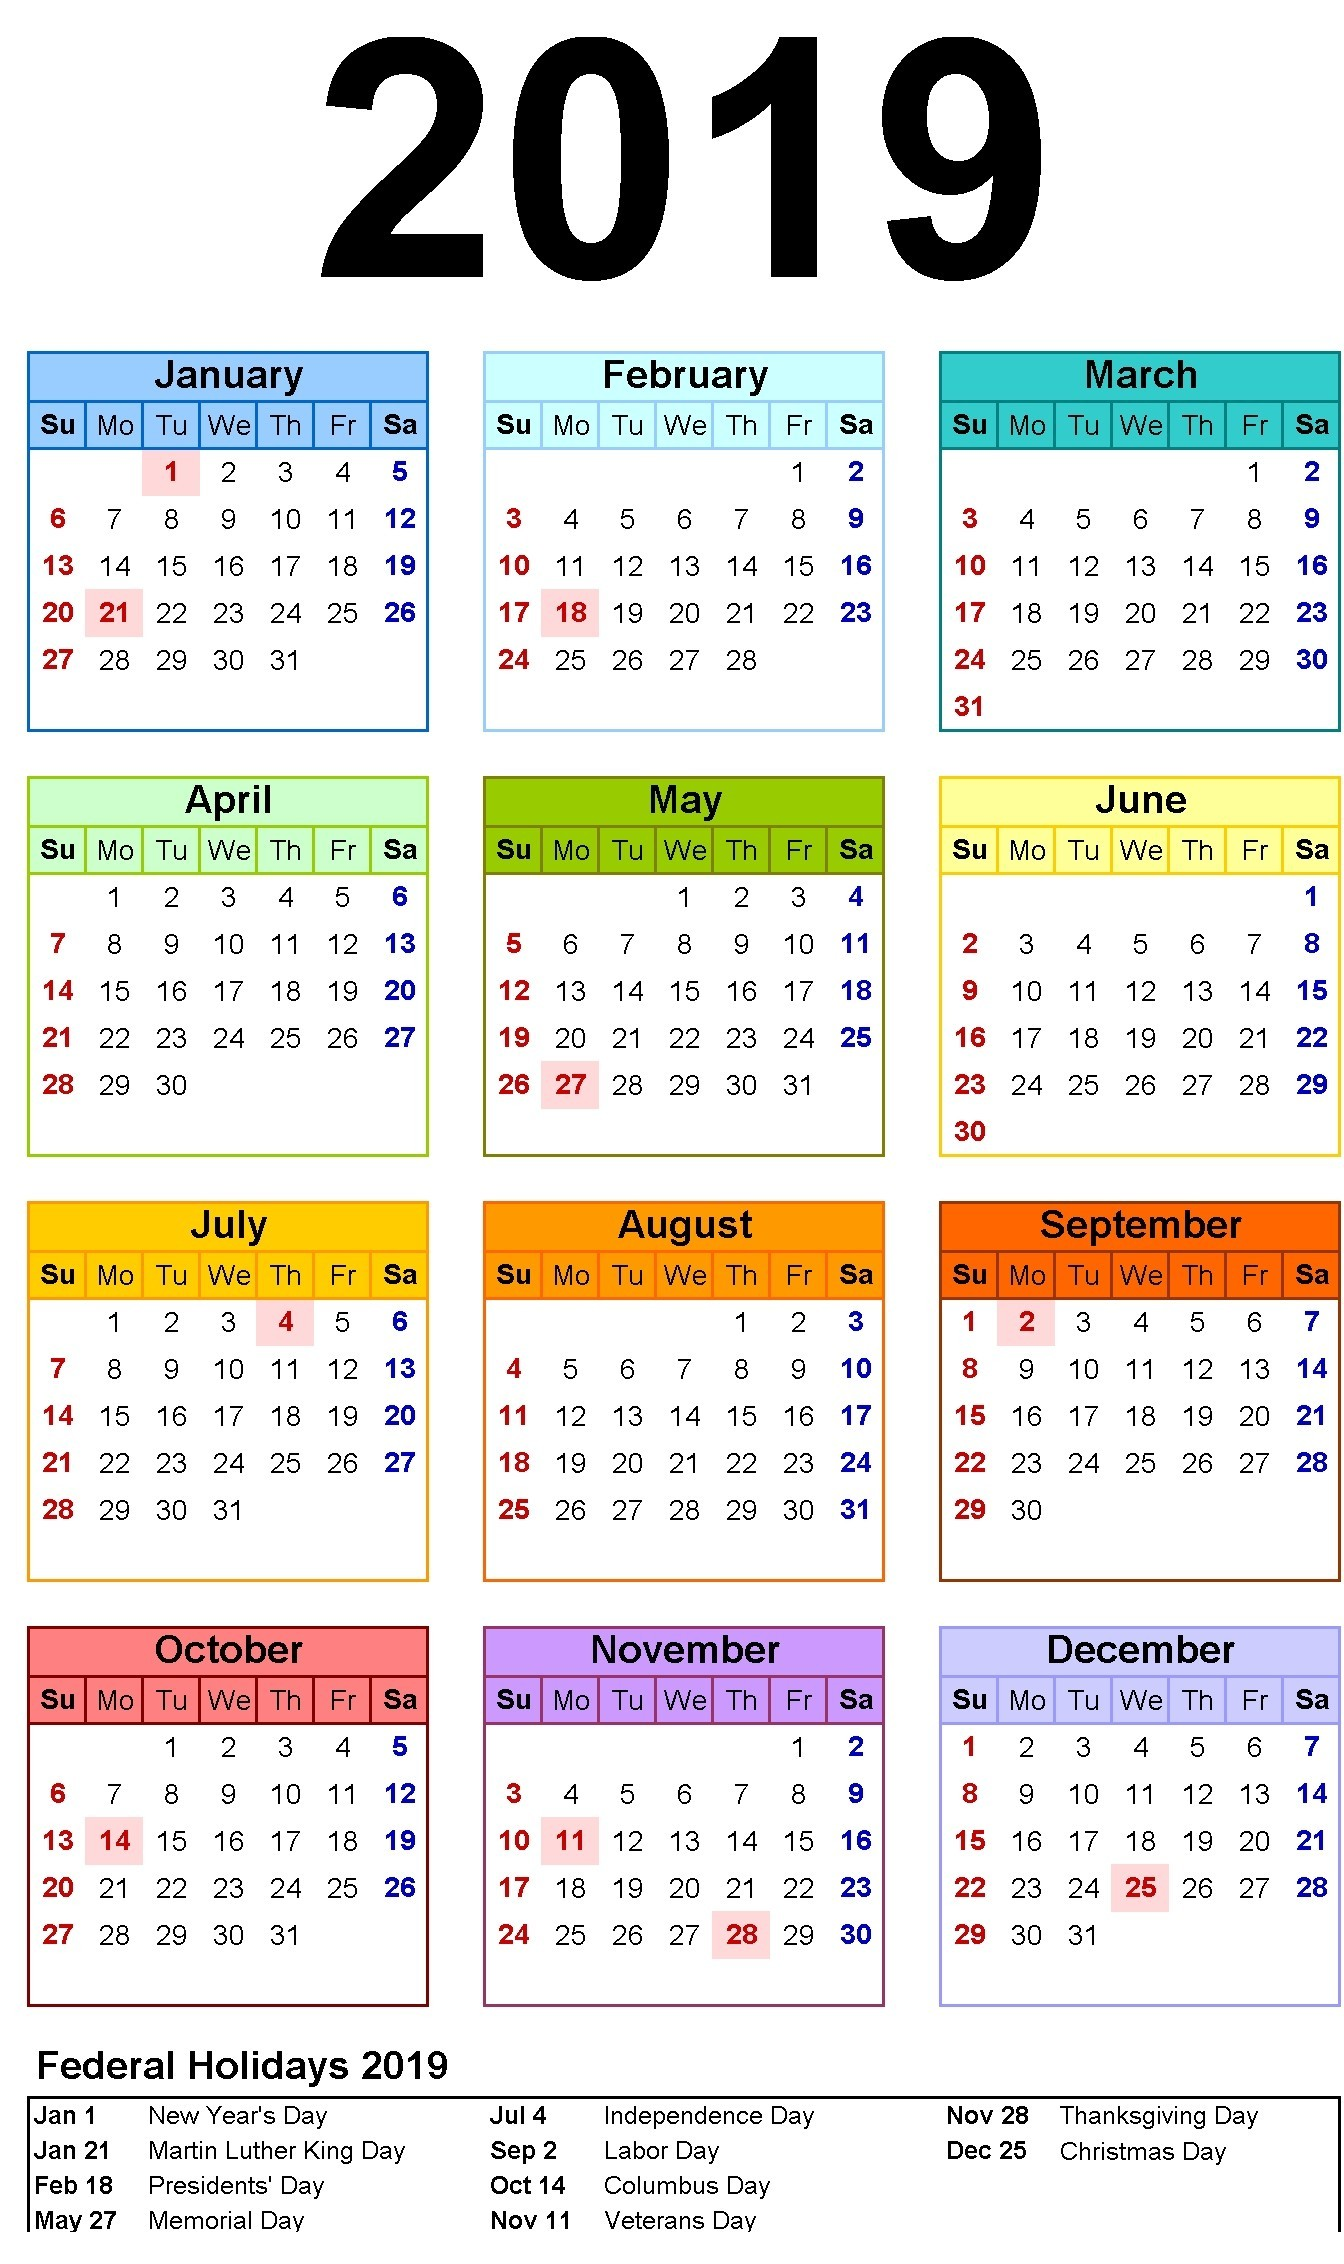 Imprimir Calendario De Google Recientes Actualidad Calendario Diciembre 2017 Para Imprimir Word Of Imprimir Calendario De Google Más Recientes Calendario Festivos Colombia 2019 Takvim Kalender Hd